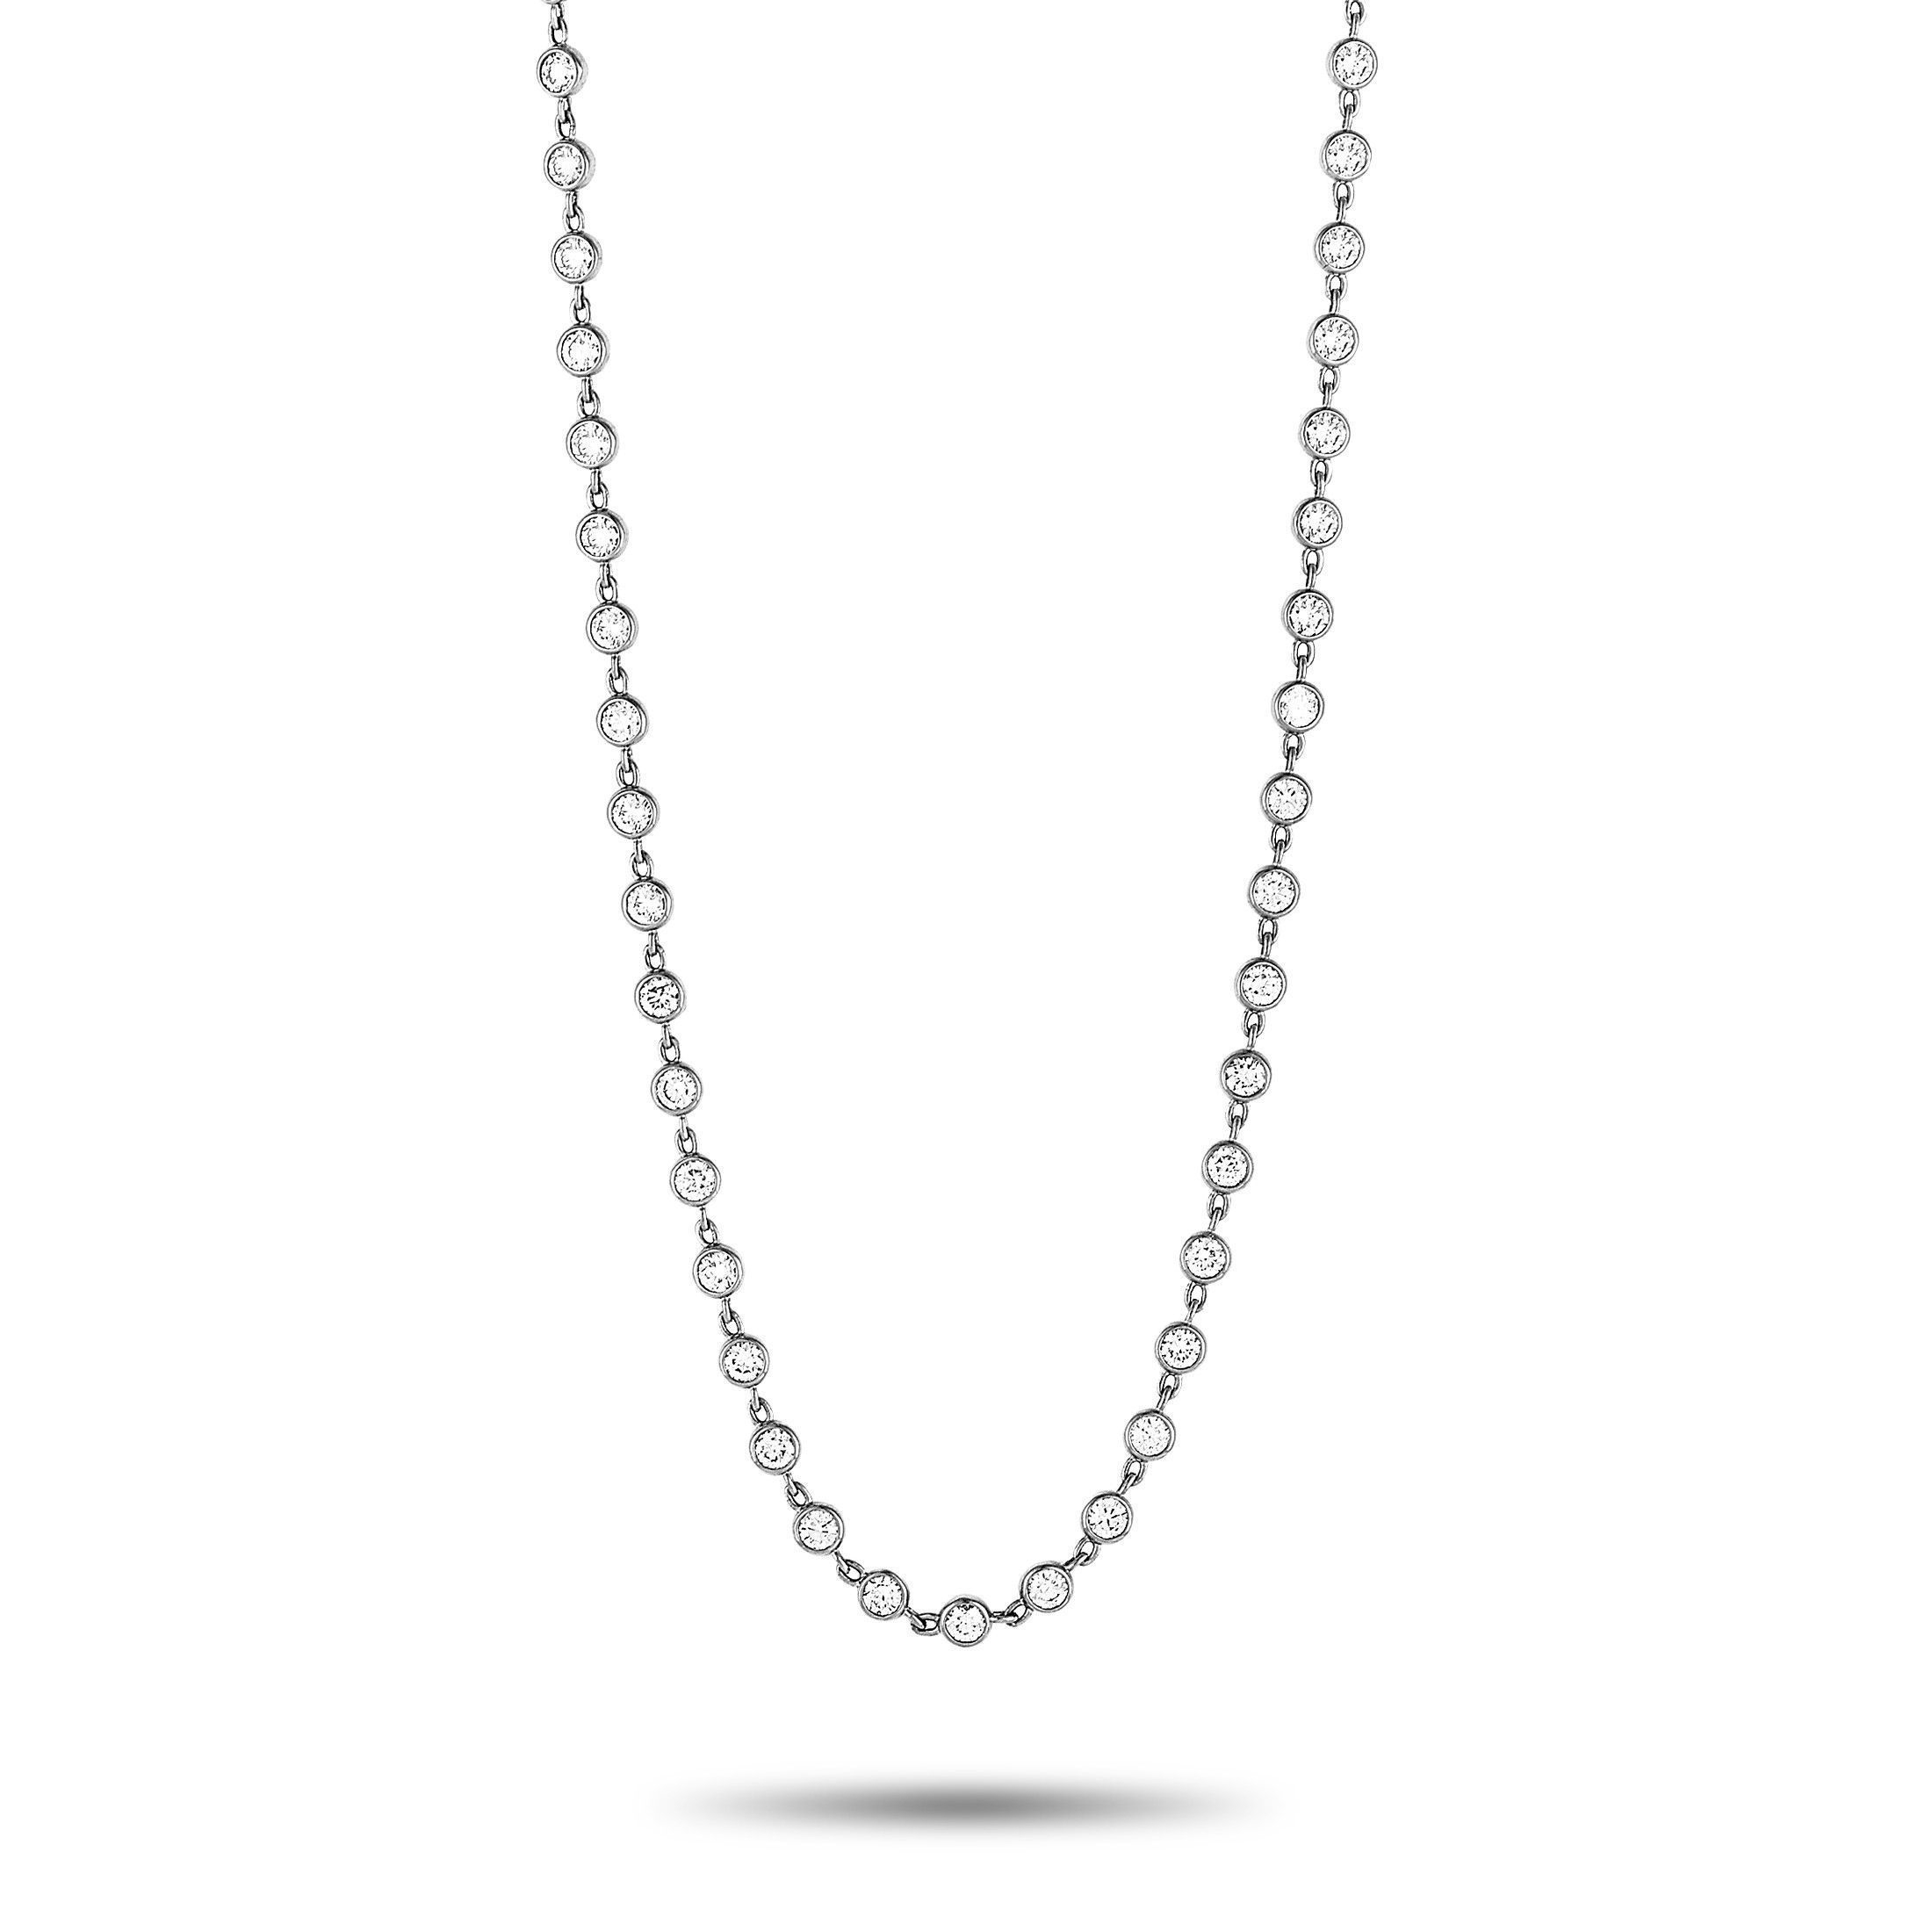 Lb Exclusive 18k White Gold Diamond Sautoir Necklace Regarding Current White Gold Diamond Sautoir Necklaces (View 1 of 25)